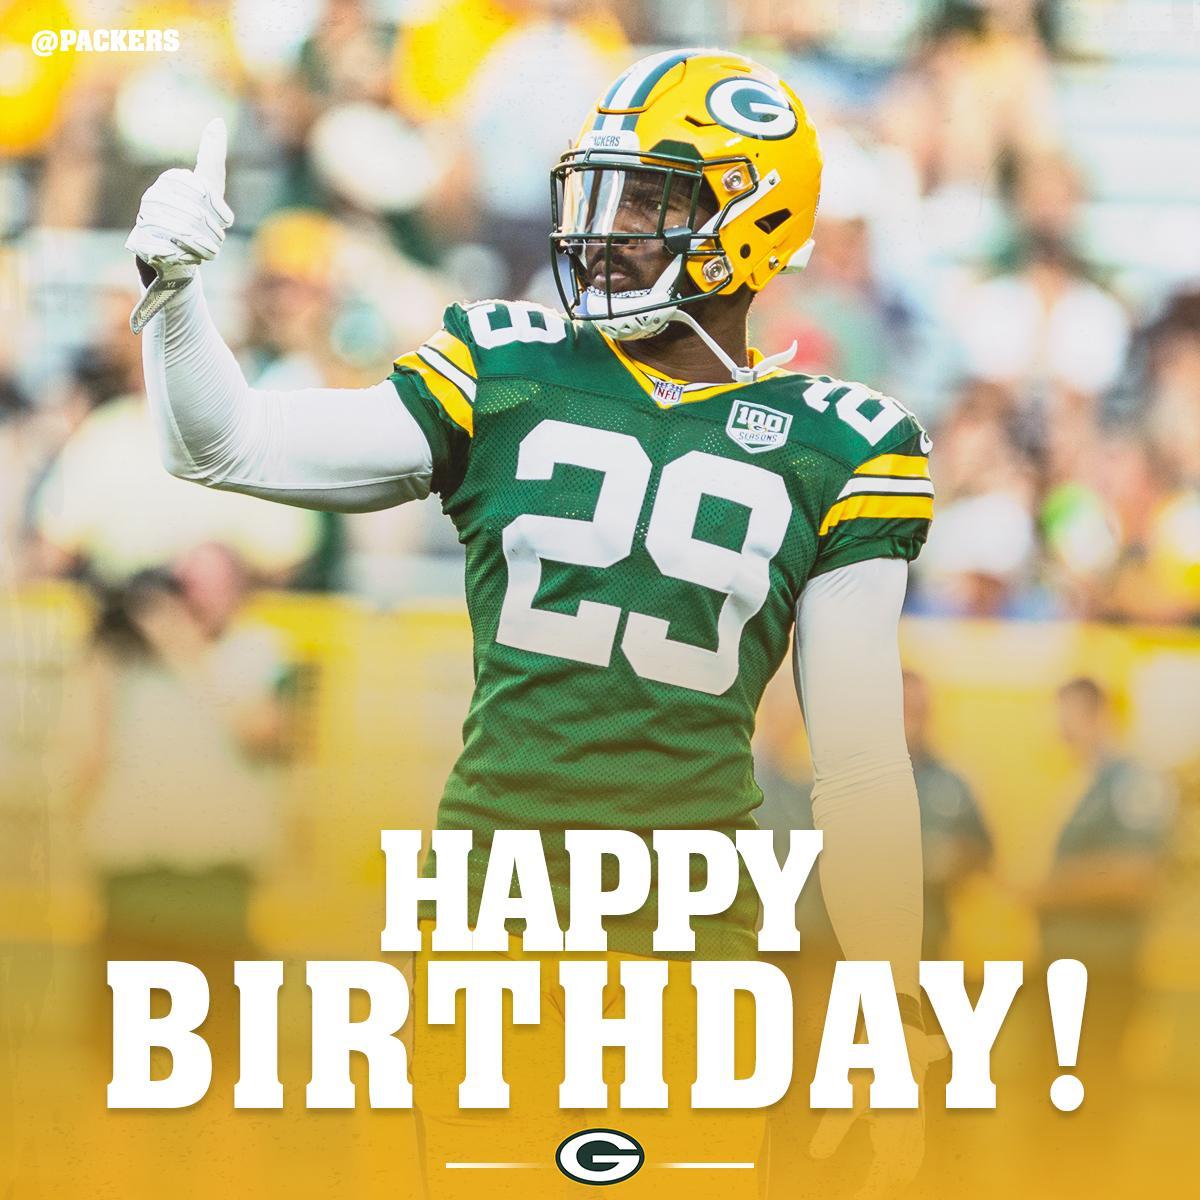 Happy Birthday Kentrellbrice Pckrs Com Xt3aq Https T Co Dzuwbddmu3 Football Green Bay Packers News Newslocker